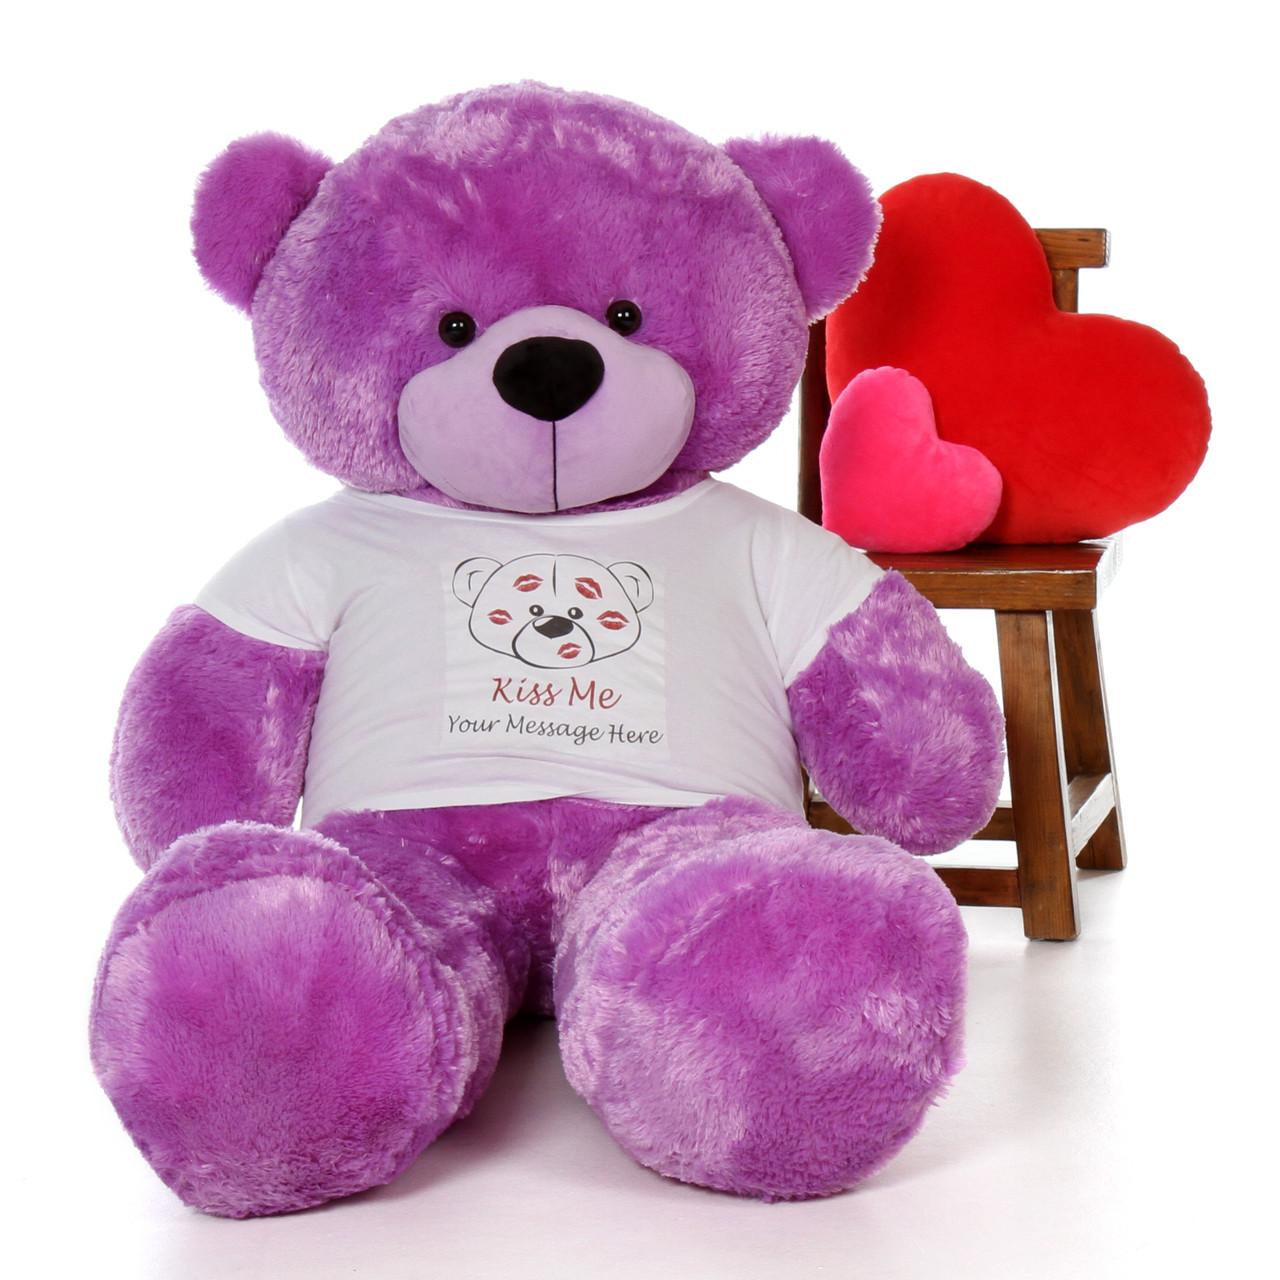 5ft DeeDee Cuddles Purple Giant Teddy in Valentine's Day Kiss Me Shirt